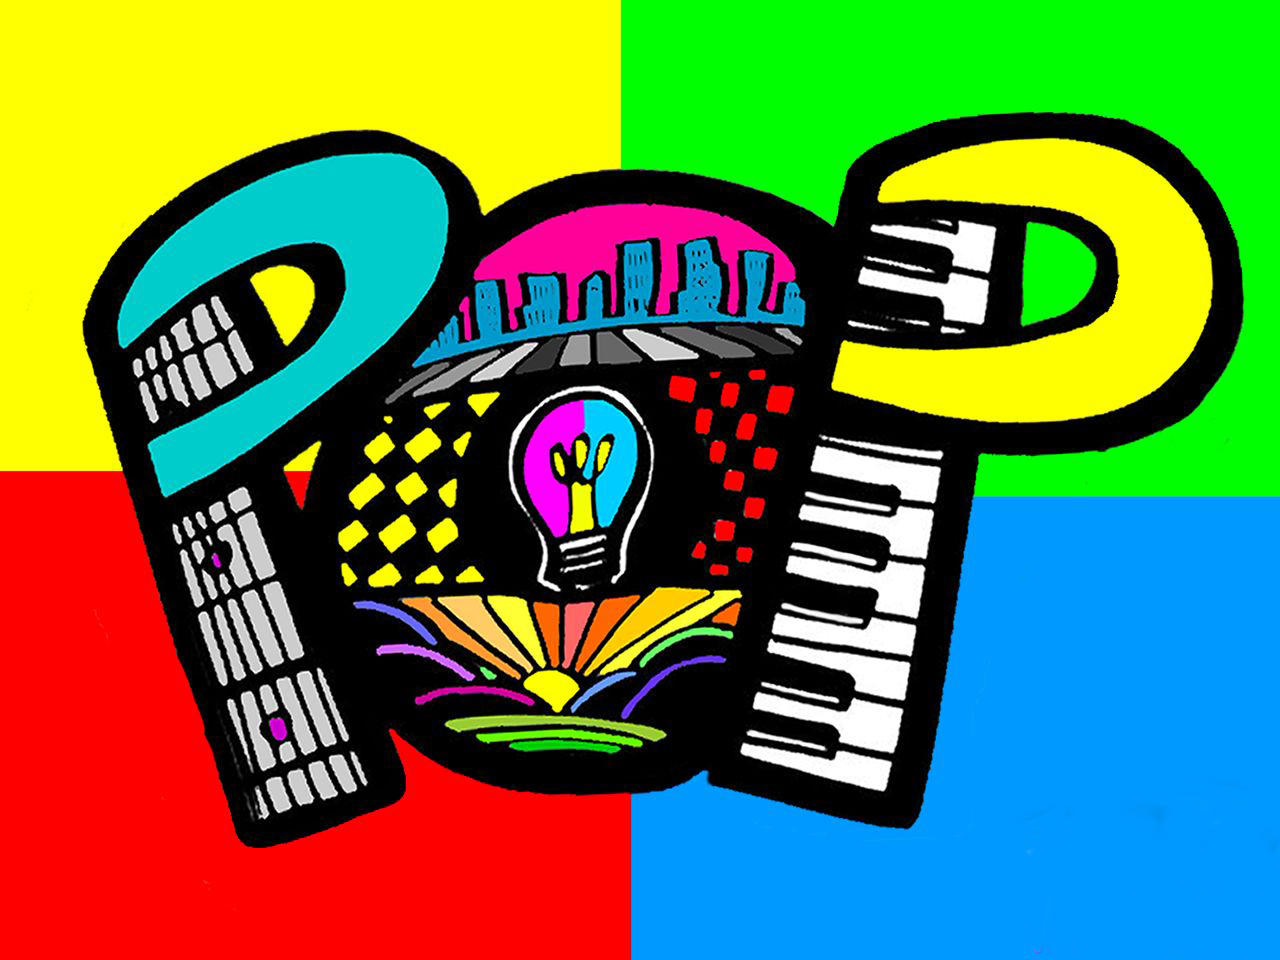 Desktop wallpapers pop art - Pop Art Desktop Wallpaper Hd Background Multi Colours